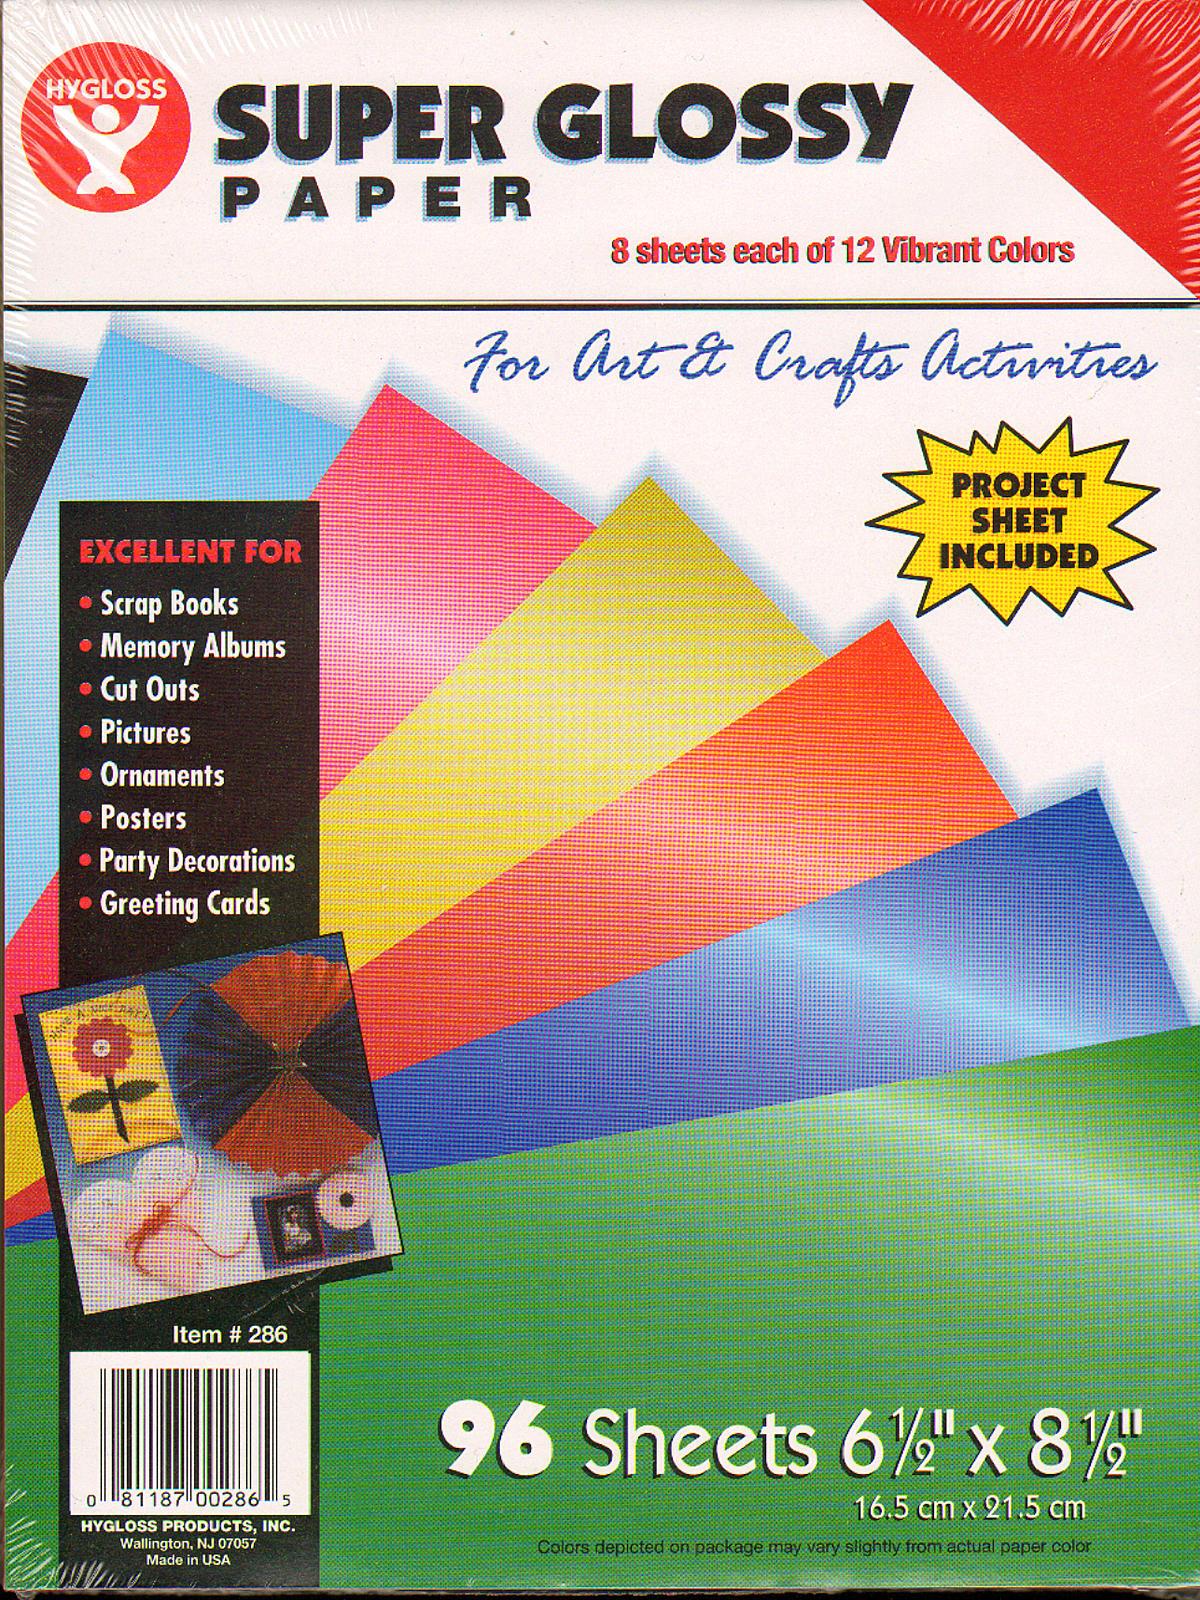 Super Glossy Paper